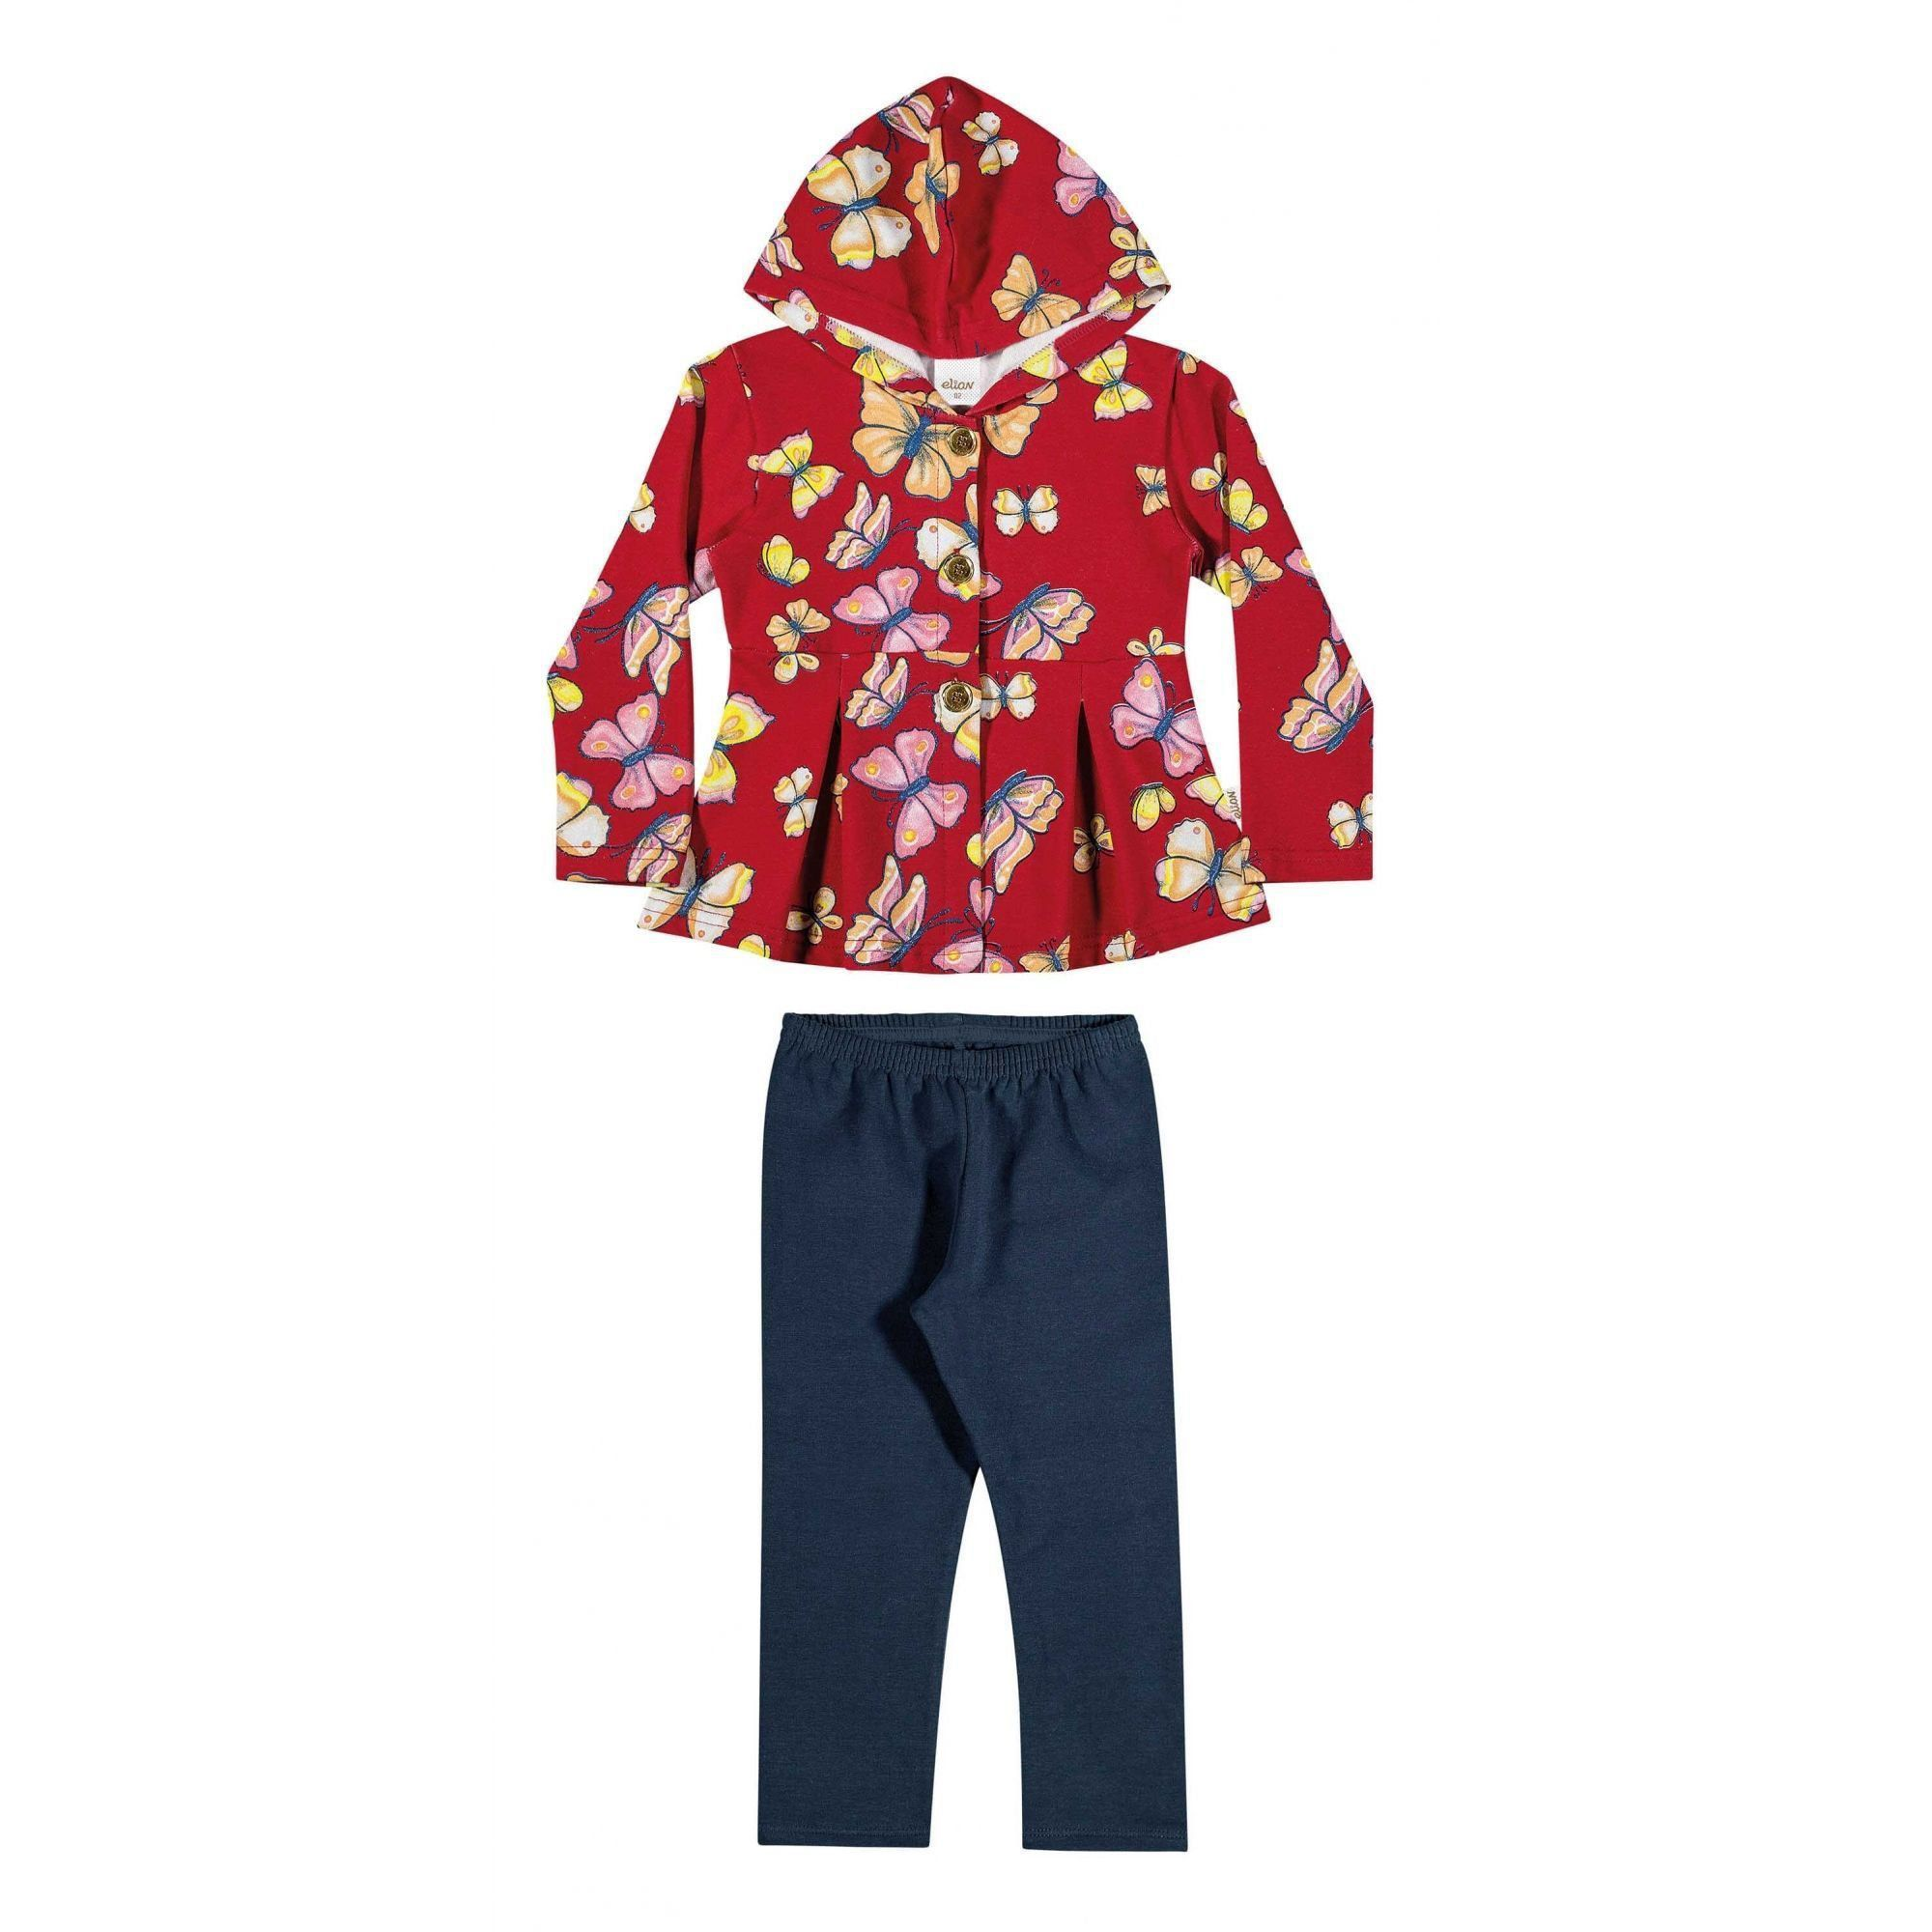 Conjunto Infantil Feminino Inverno Vermelho Borboletas Elian